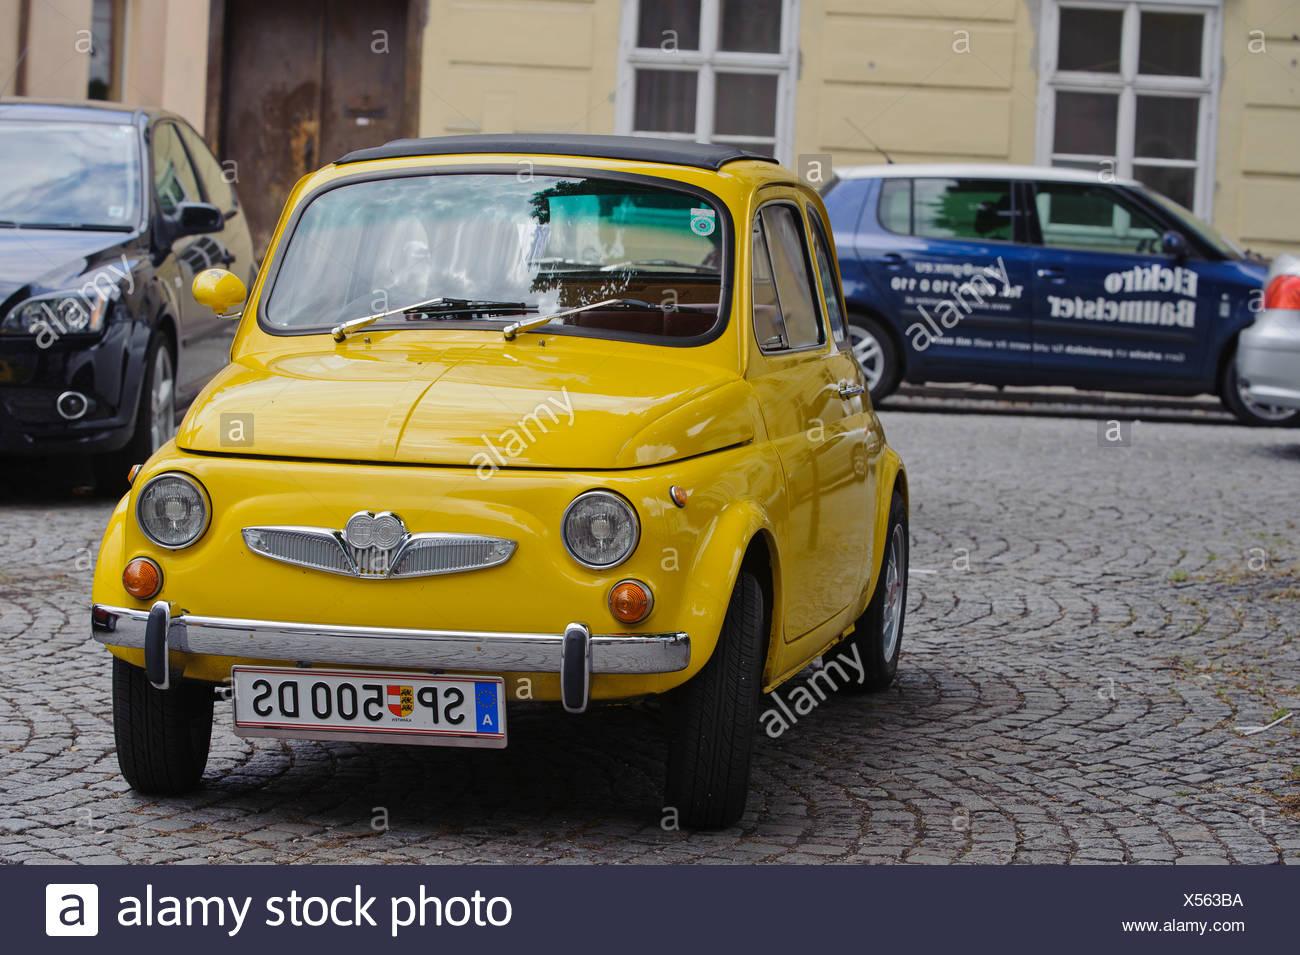 Fiat 500, classic car, Krems, Wachau valley, Lower Austria, Austria, Europe - Stock Image